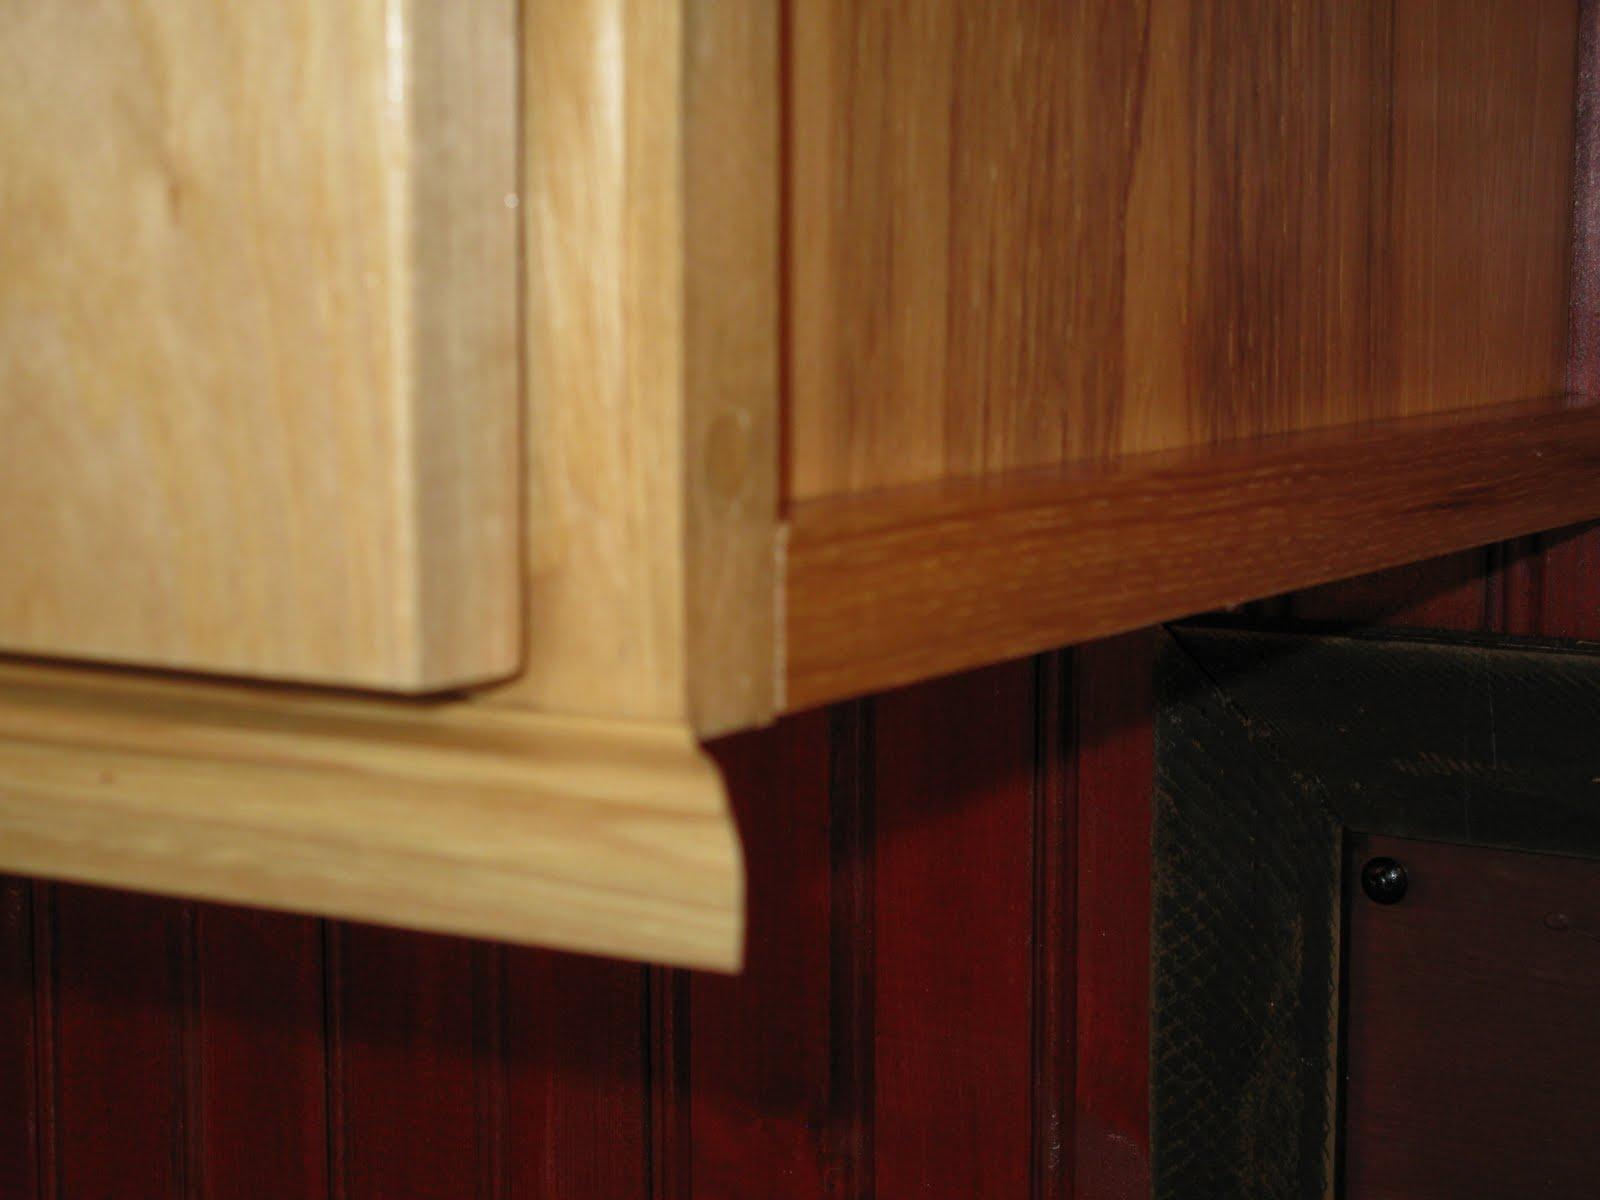 kitchen cabinet trim installation island vent for bottom of cabinets design ideas